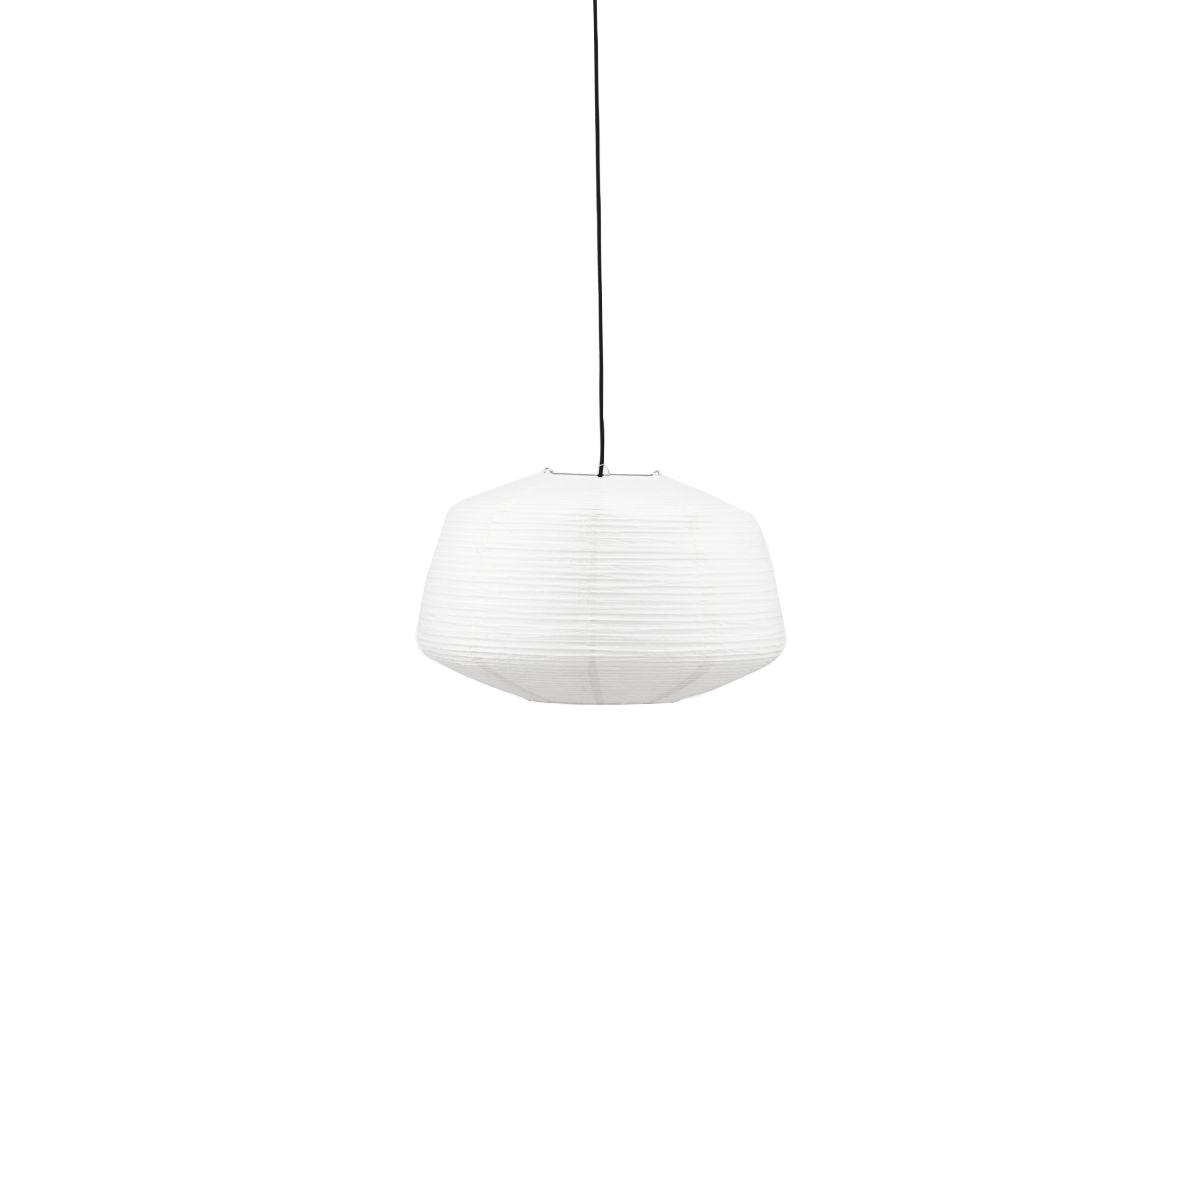 House Doctor - Bidar Lamp Shade Ø 50 cm - White (259370101)